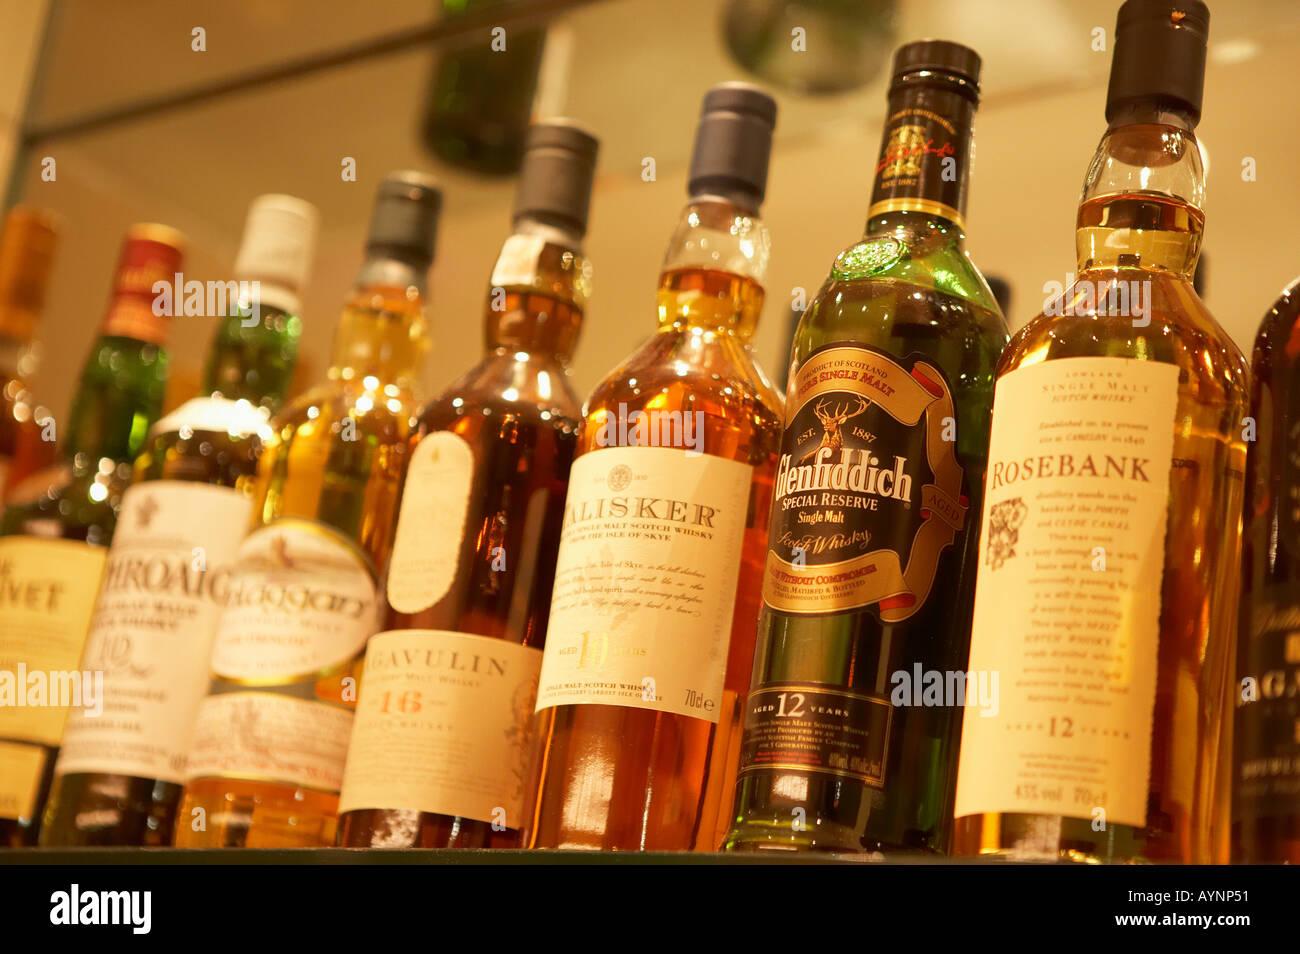 SELECTION OF SCOTCH WHISKY BOTTLES ON GLASS SHELVES IN BAR Stock ...